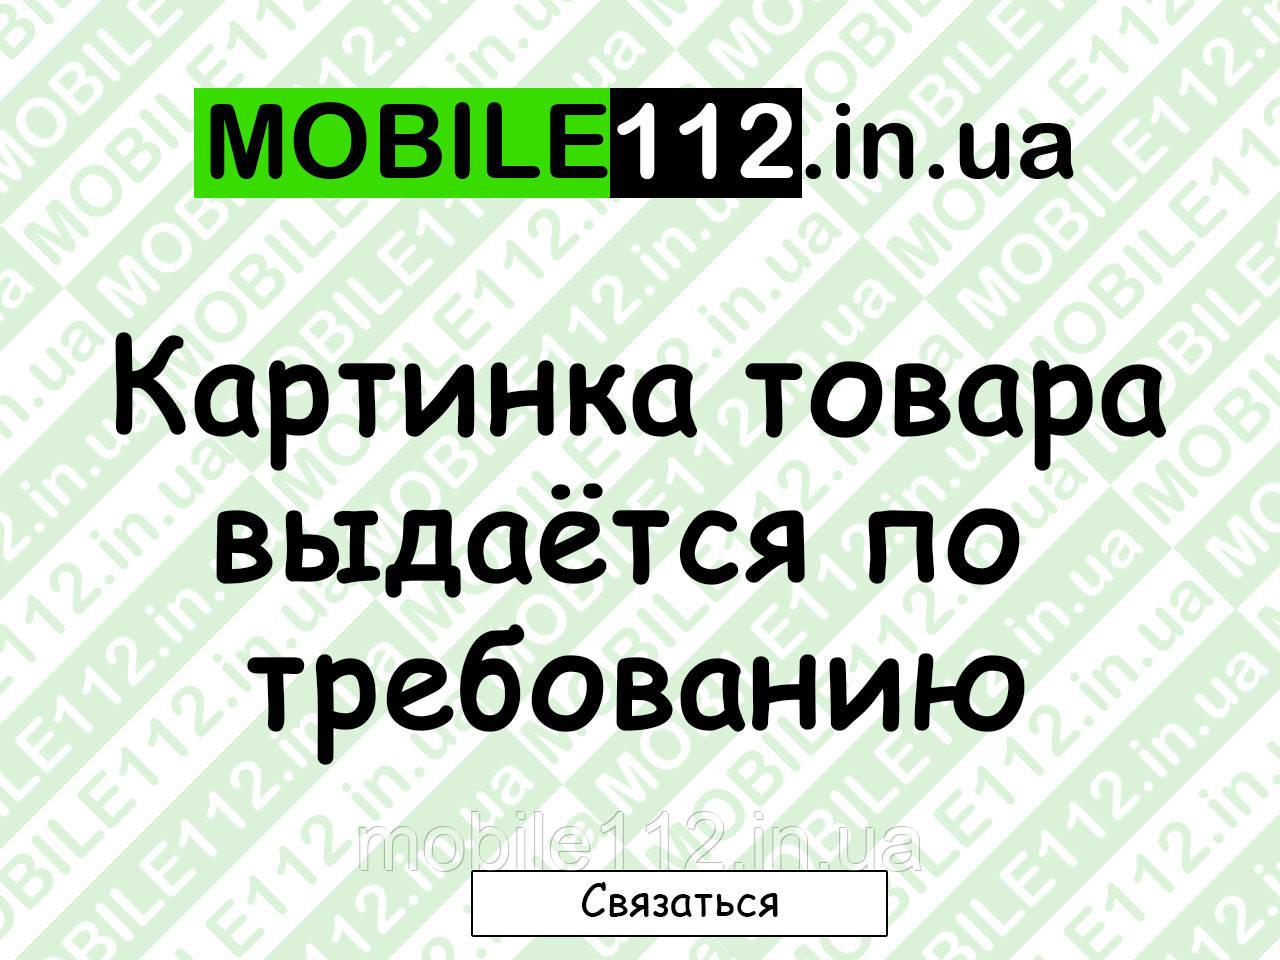 Тачскрин для Nokia 501 Asha, чёрный, оригинал (Китай)  big ic(5mm)/ small ic(4mm)